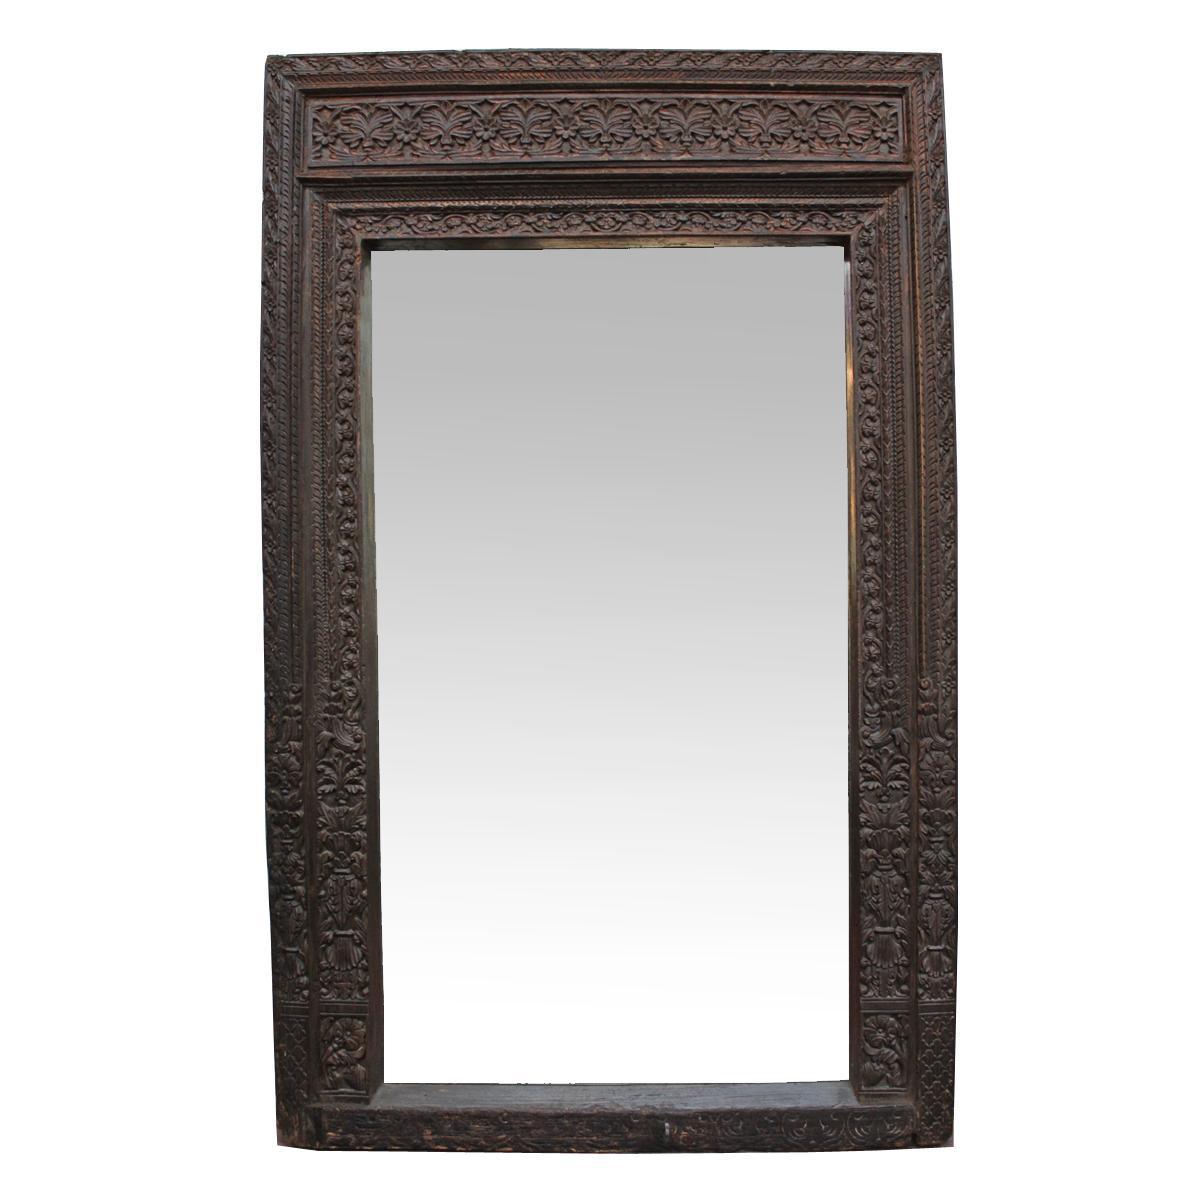 Indian Mirror 2 photo - 10